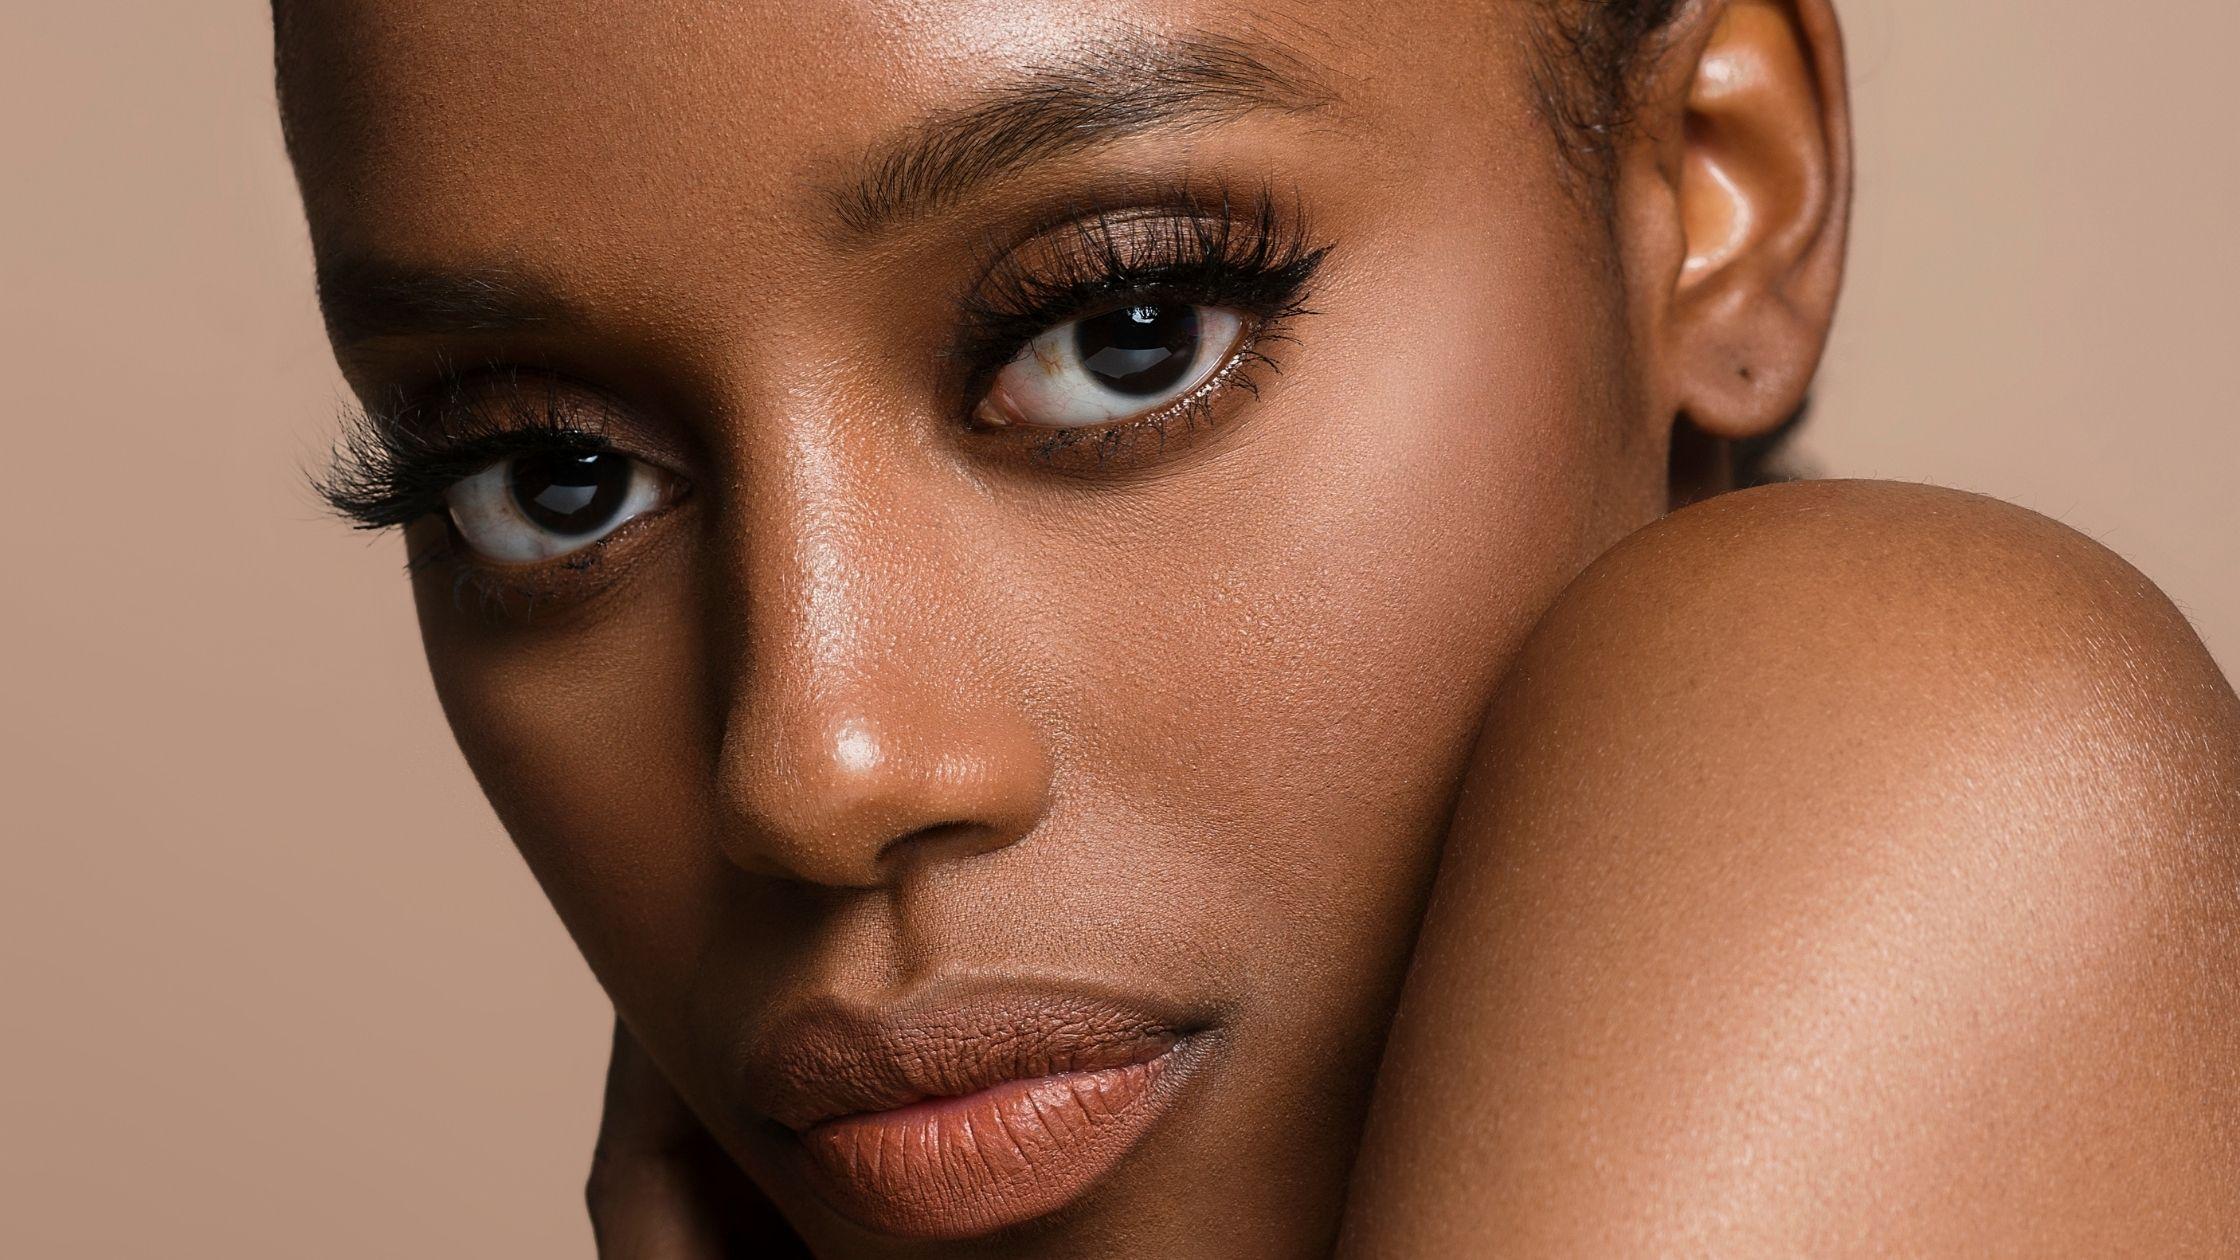 Face yoga – Does face yoga really work? Wrinkles? Best face yoga? methods?